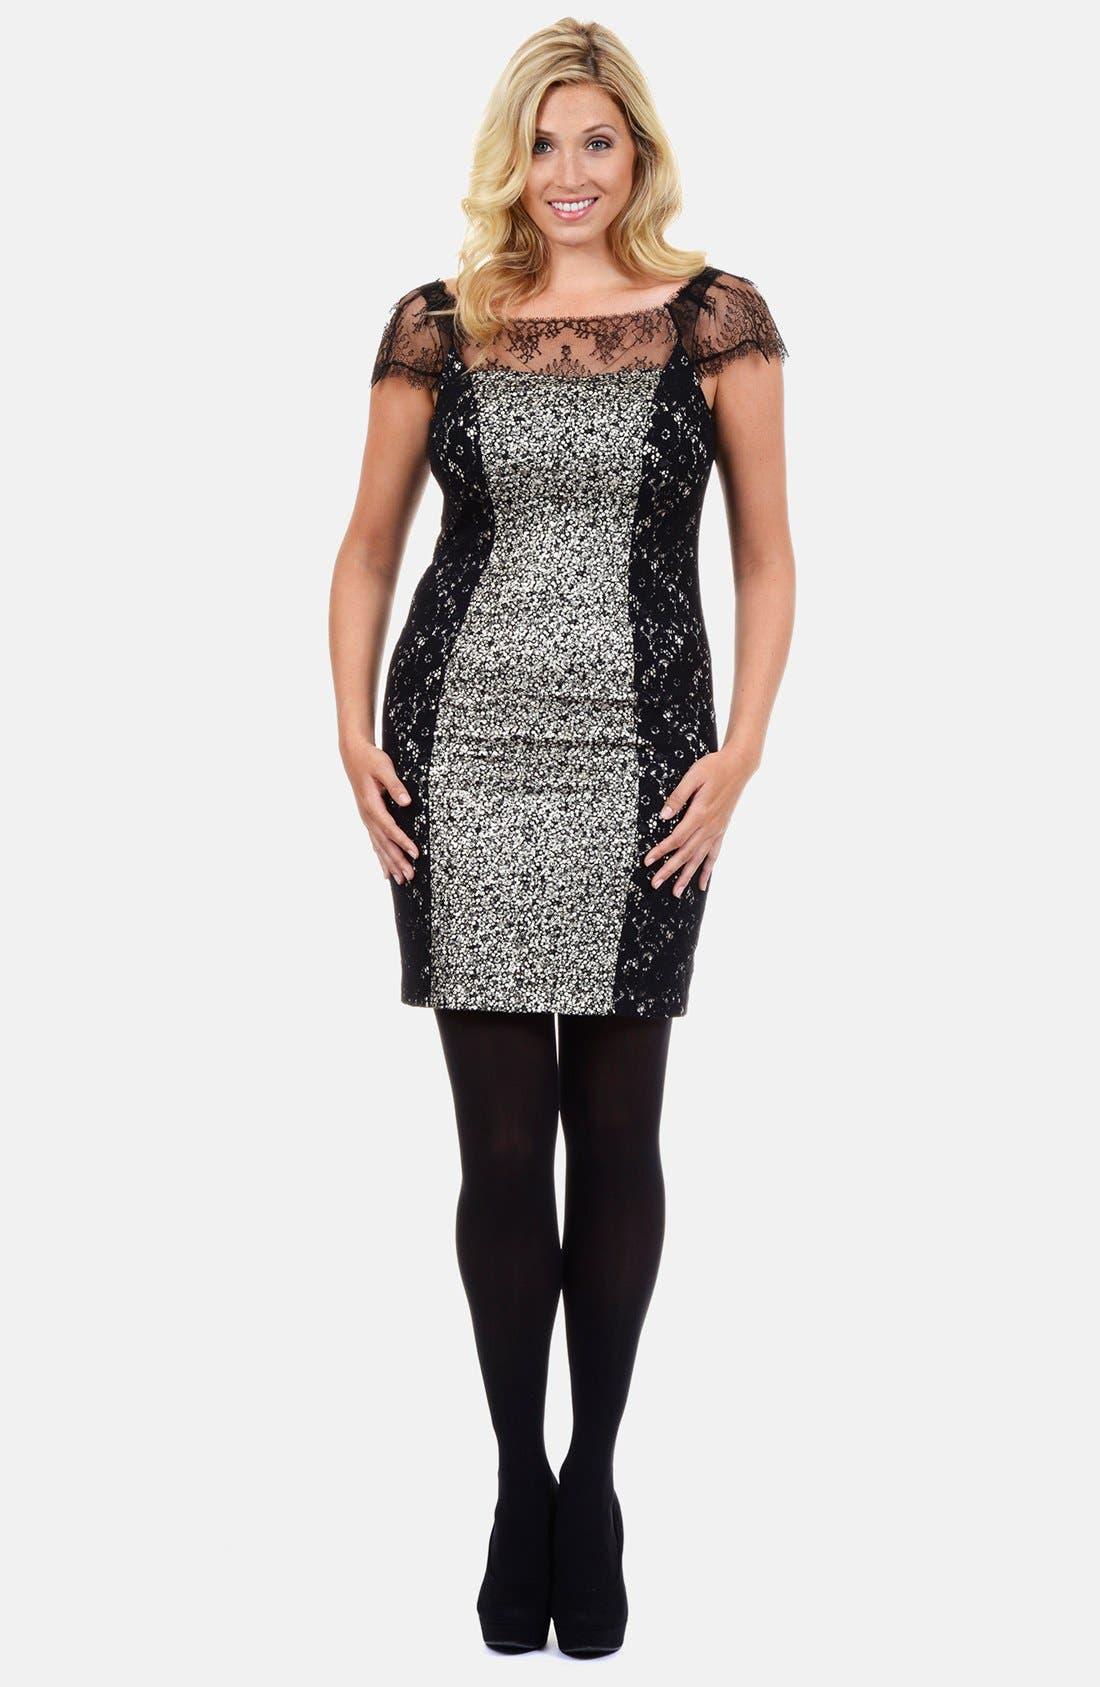 Alternate Image 1 Selected - Kay Unger Lace Paneled & Foiled Knit Sheath Dress (Plus Size)